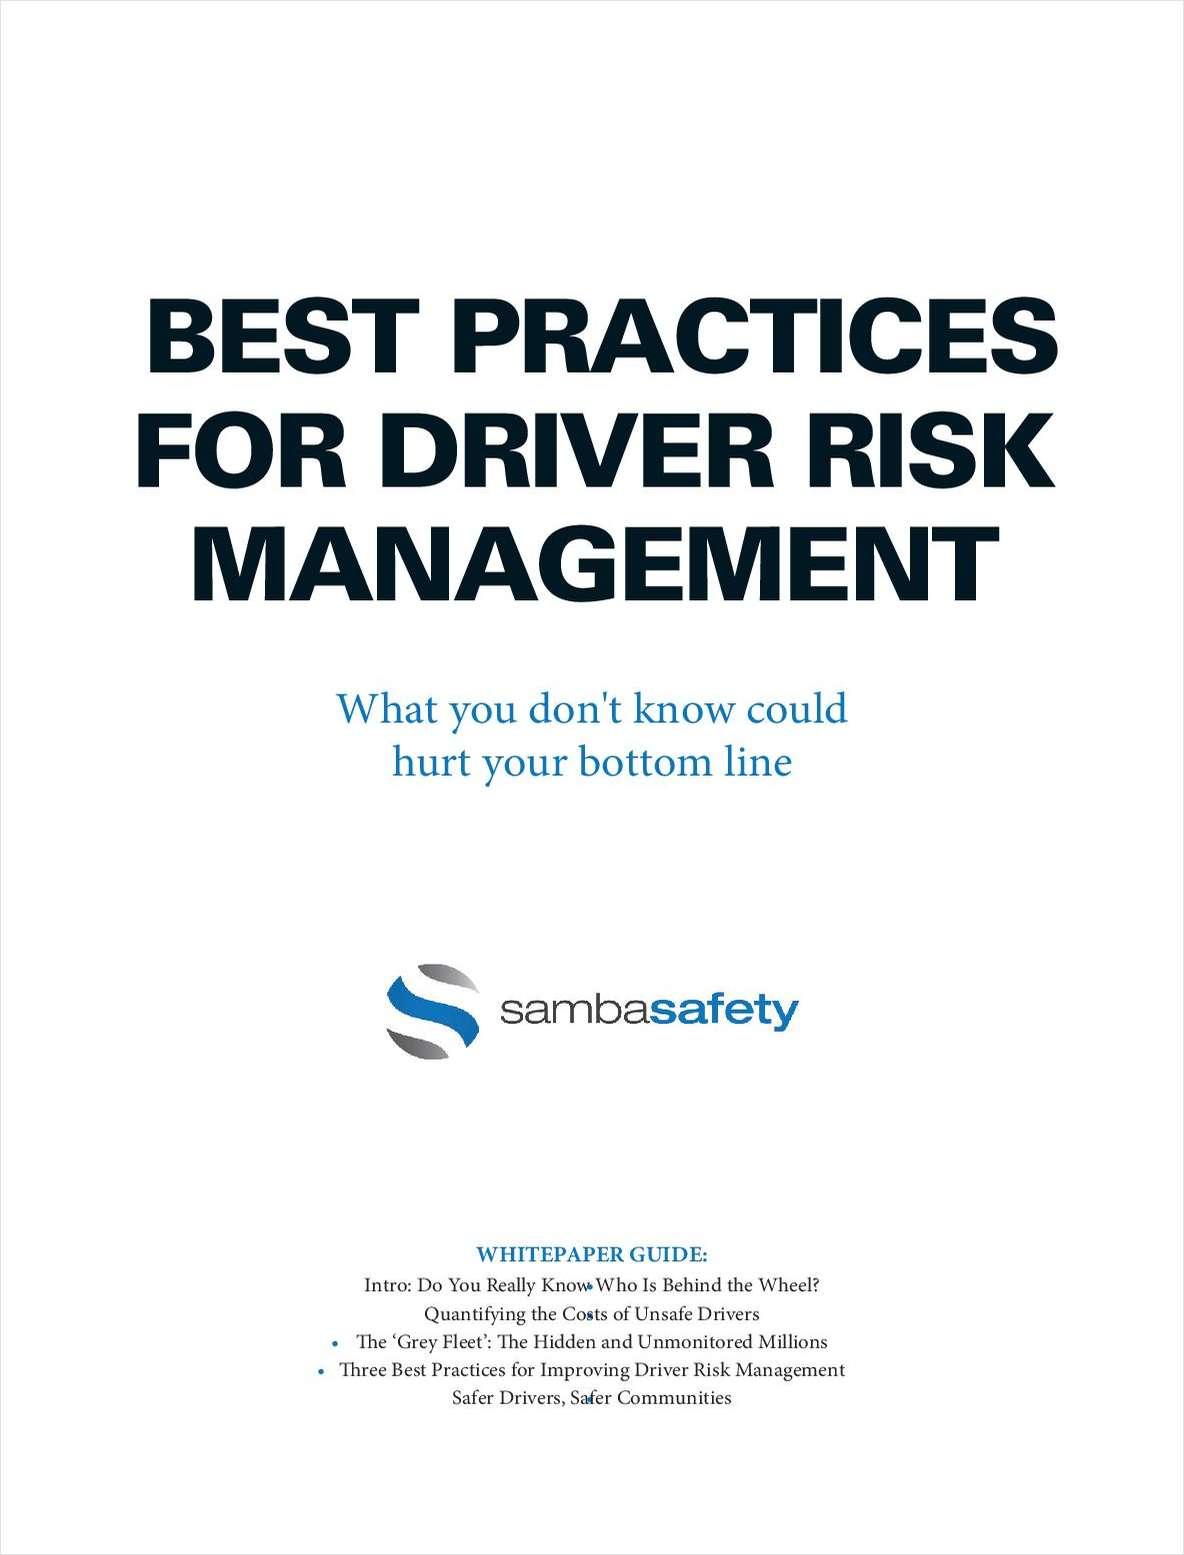 Best Practices for Driver Risk Management